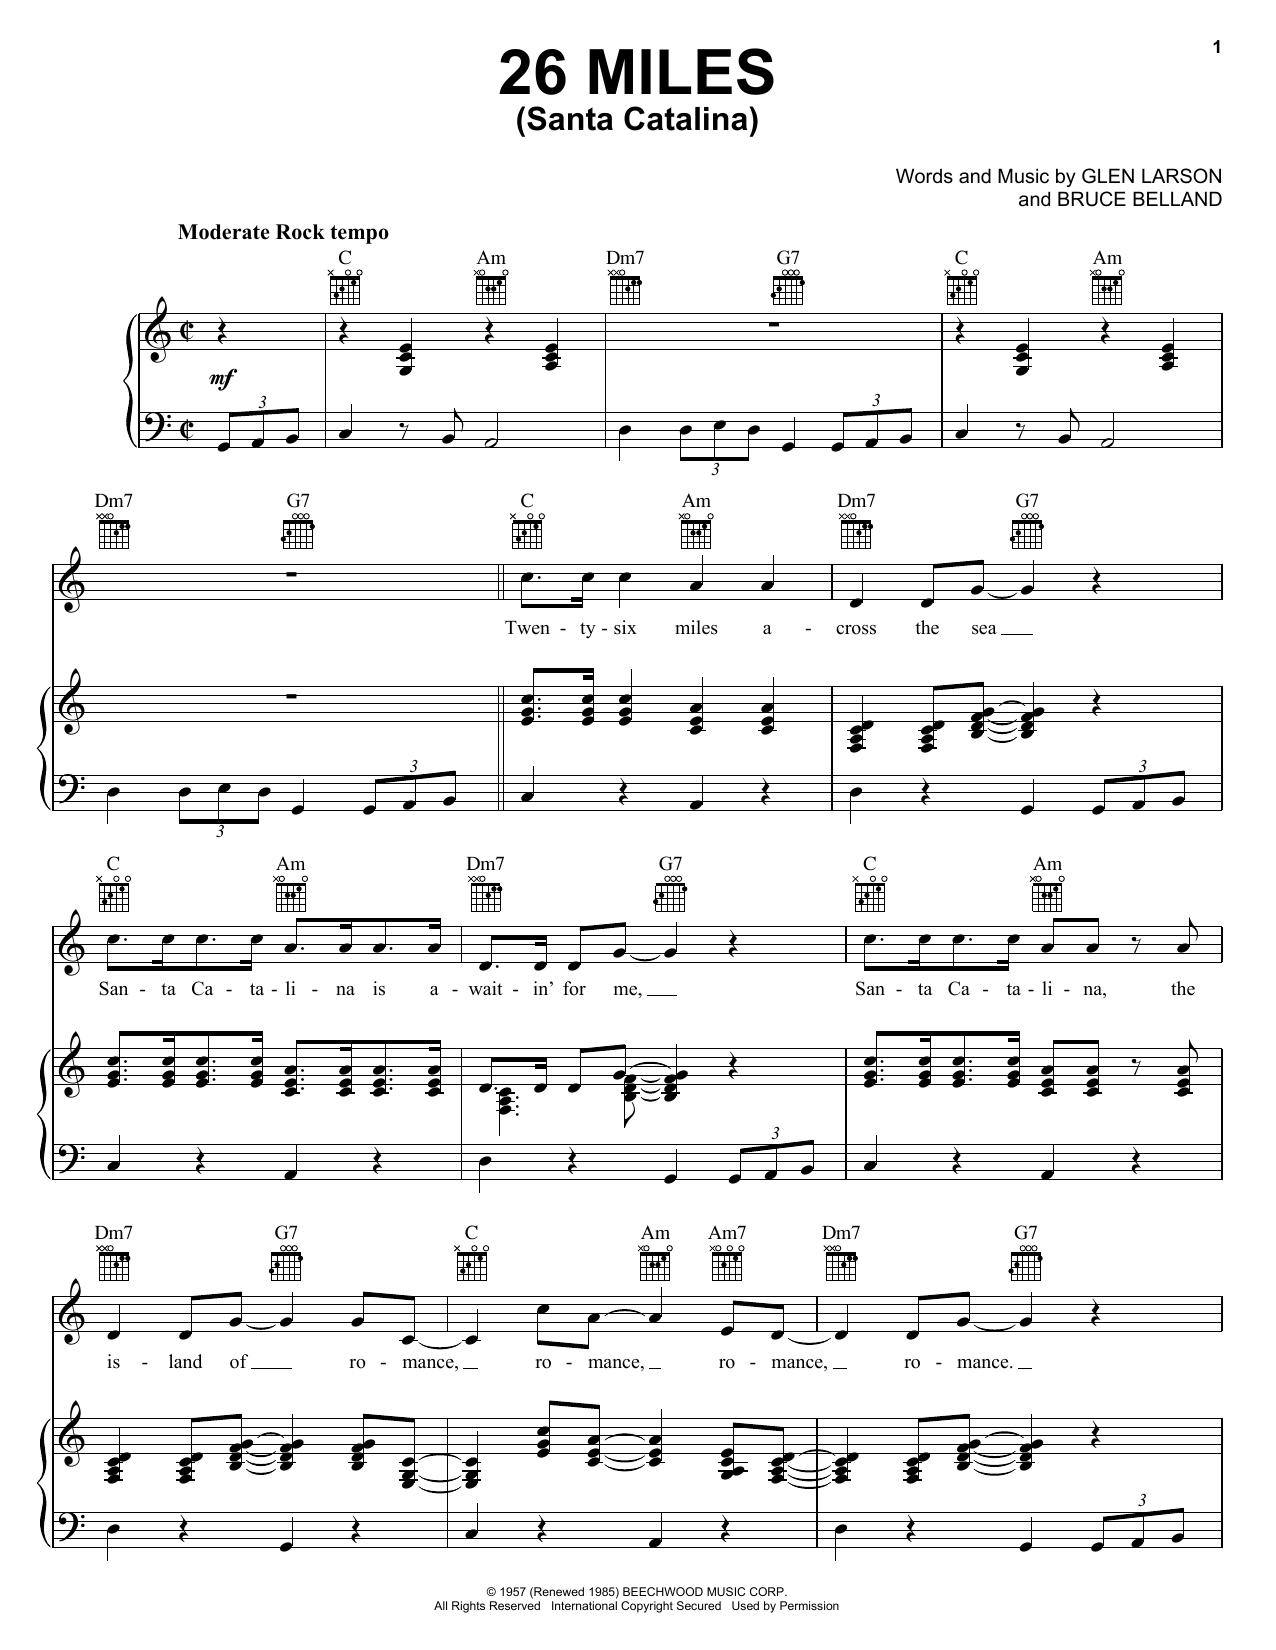 Four Preps 26 Miles (Santa Catalina) sheet music notes and chords. Download Printable PDF.